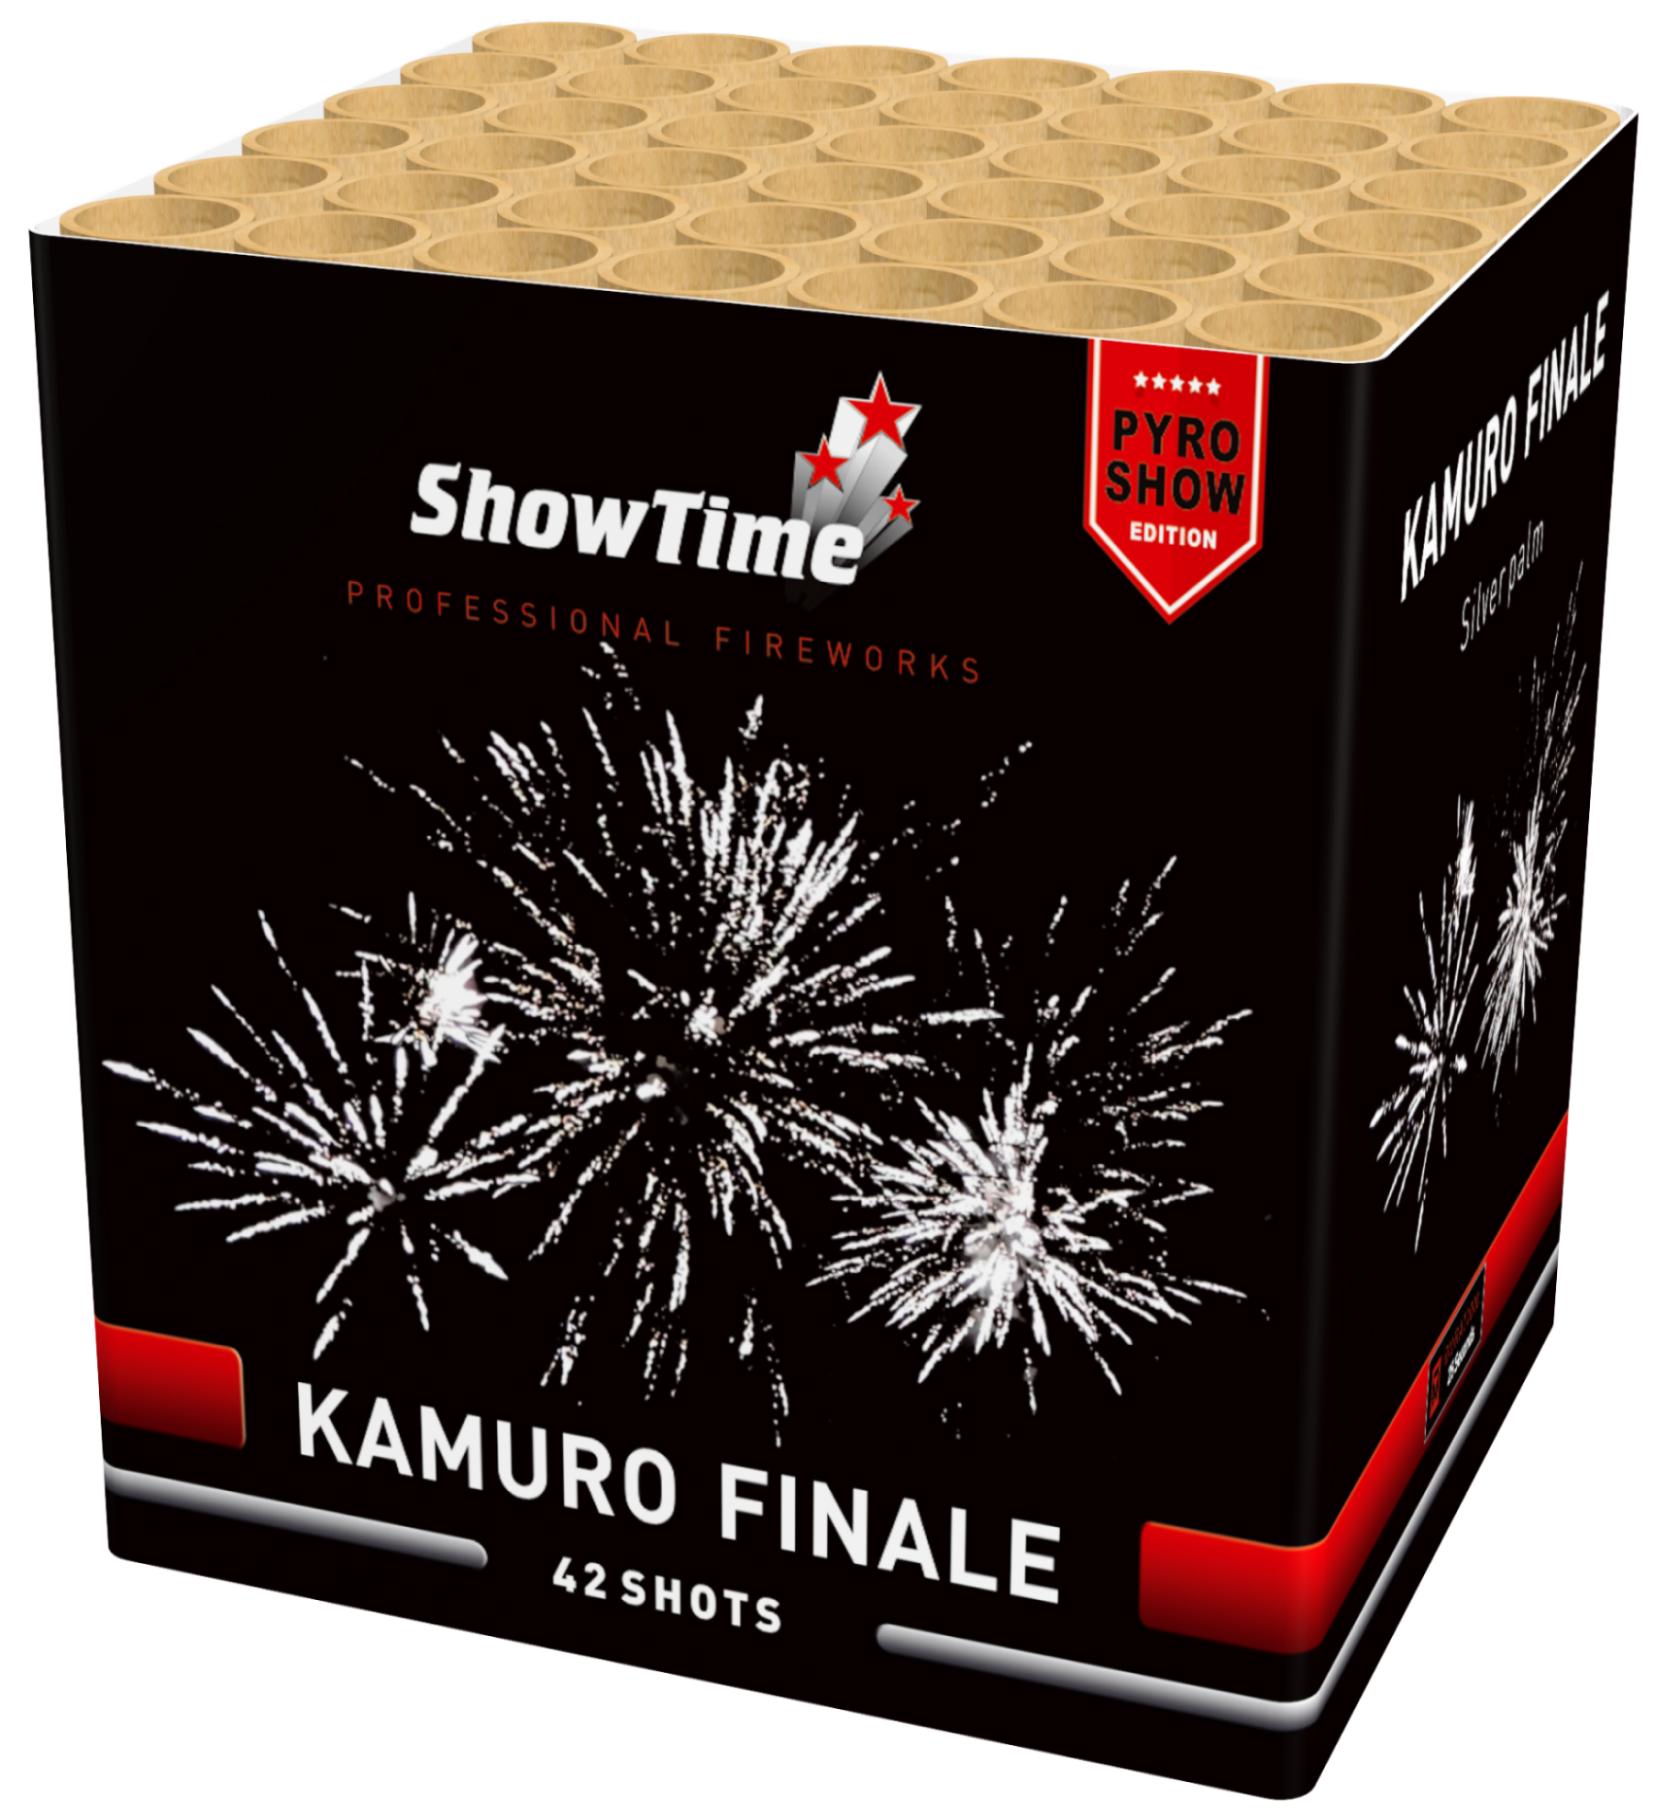 Kamuro Finale